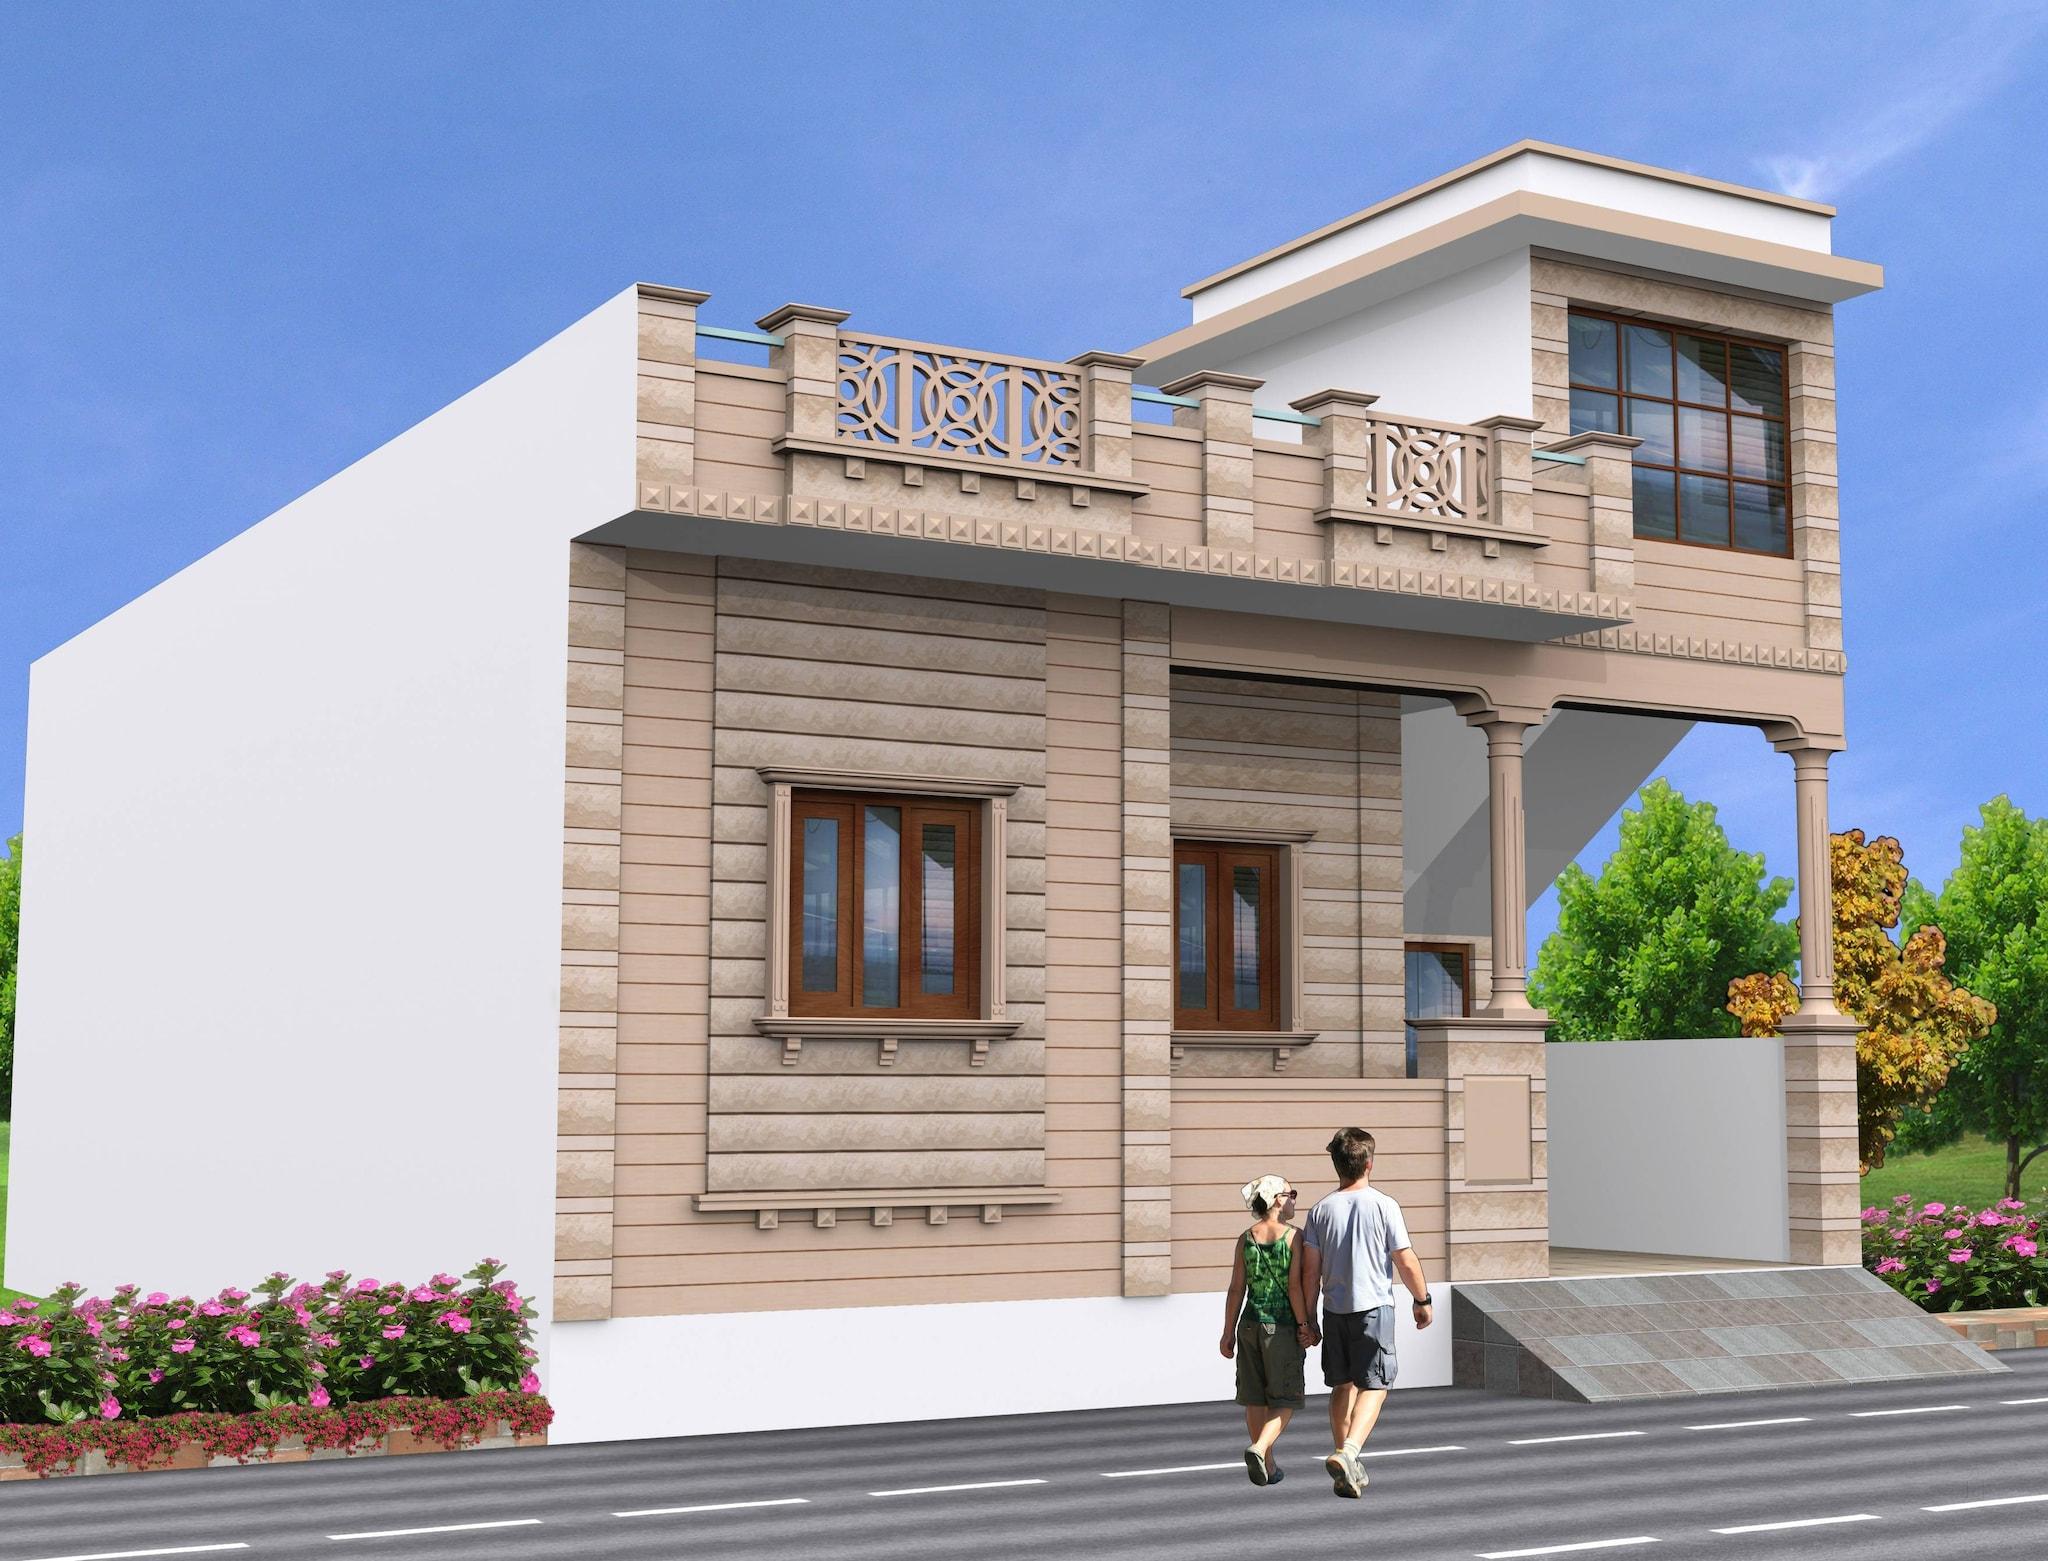 Shri Ram Interiors Civil Interior Designer Chopasni Road Architects In Jodhpur Justdial